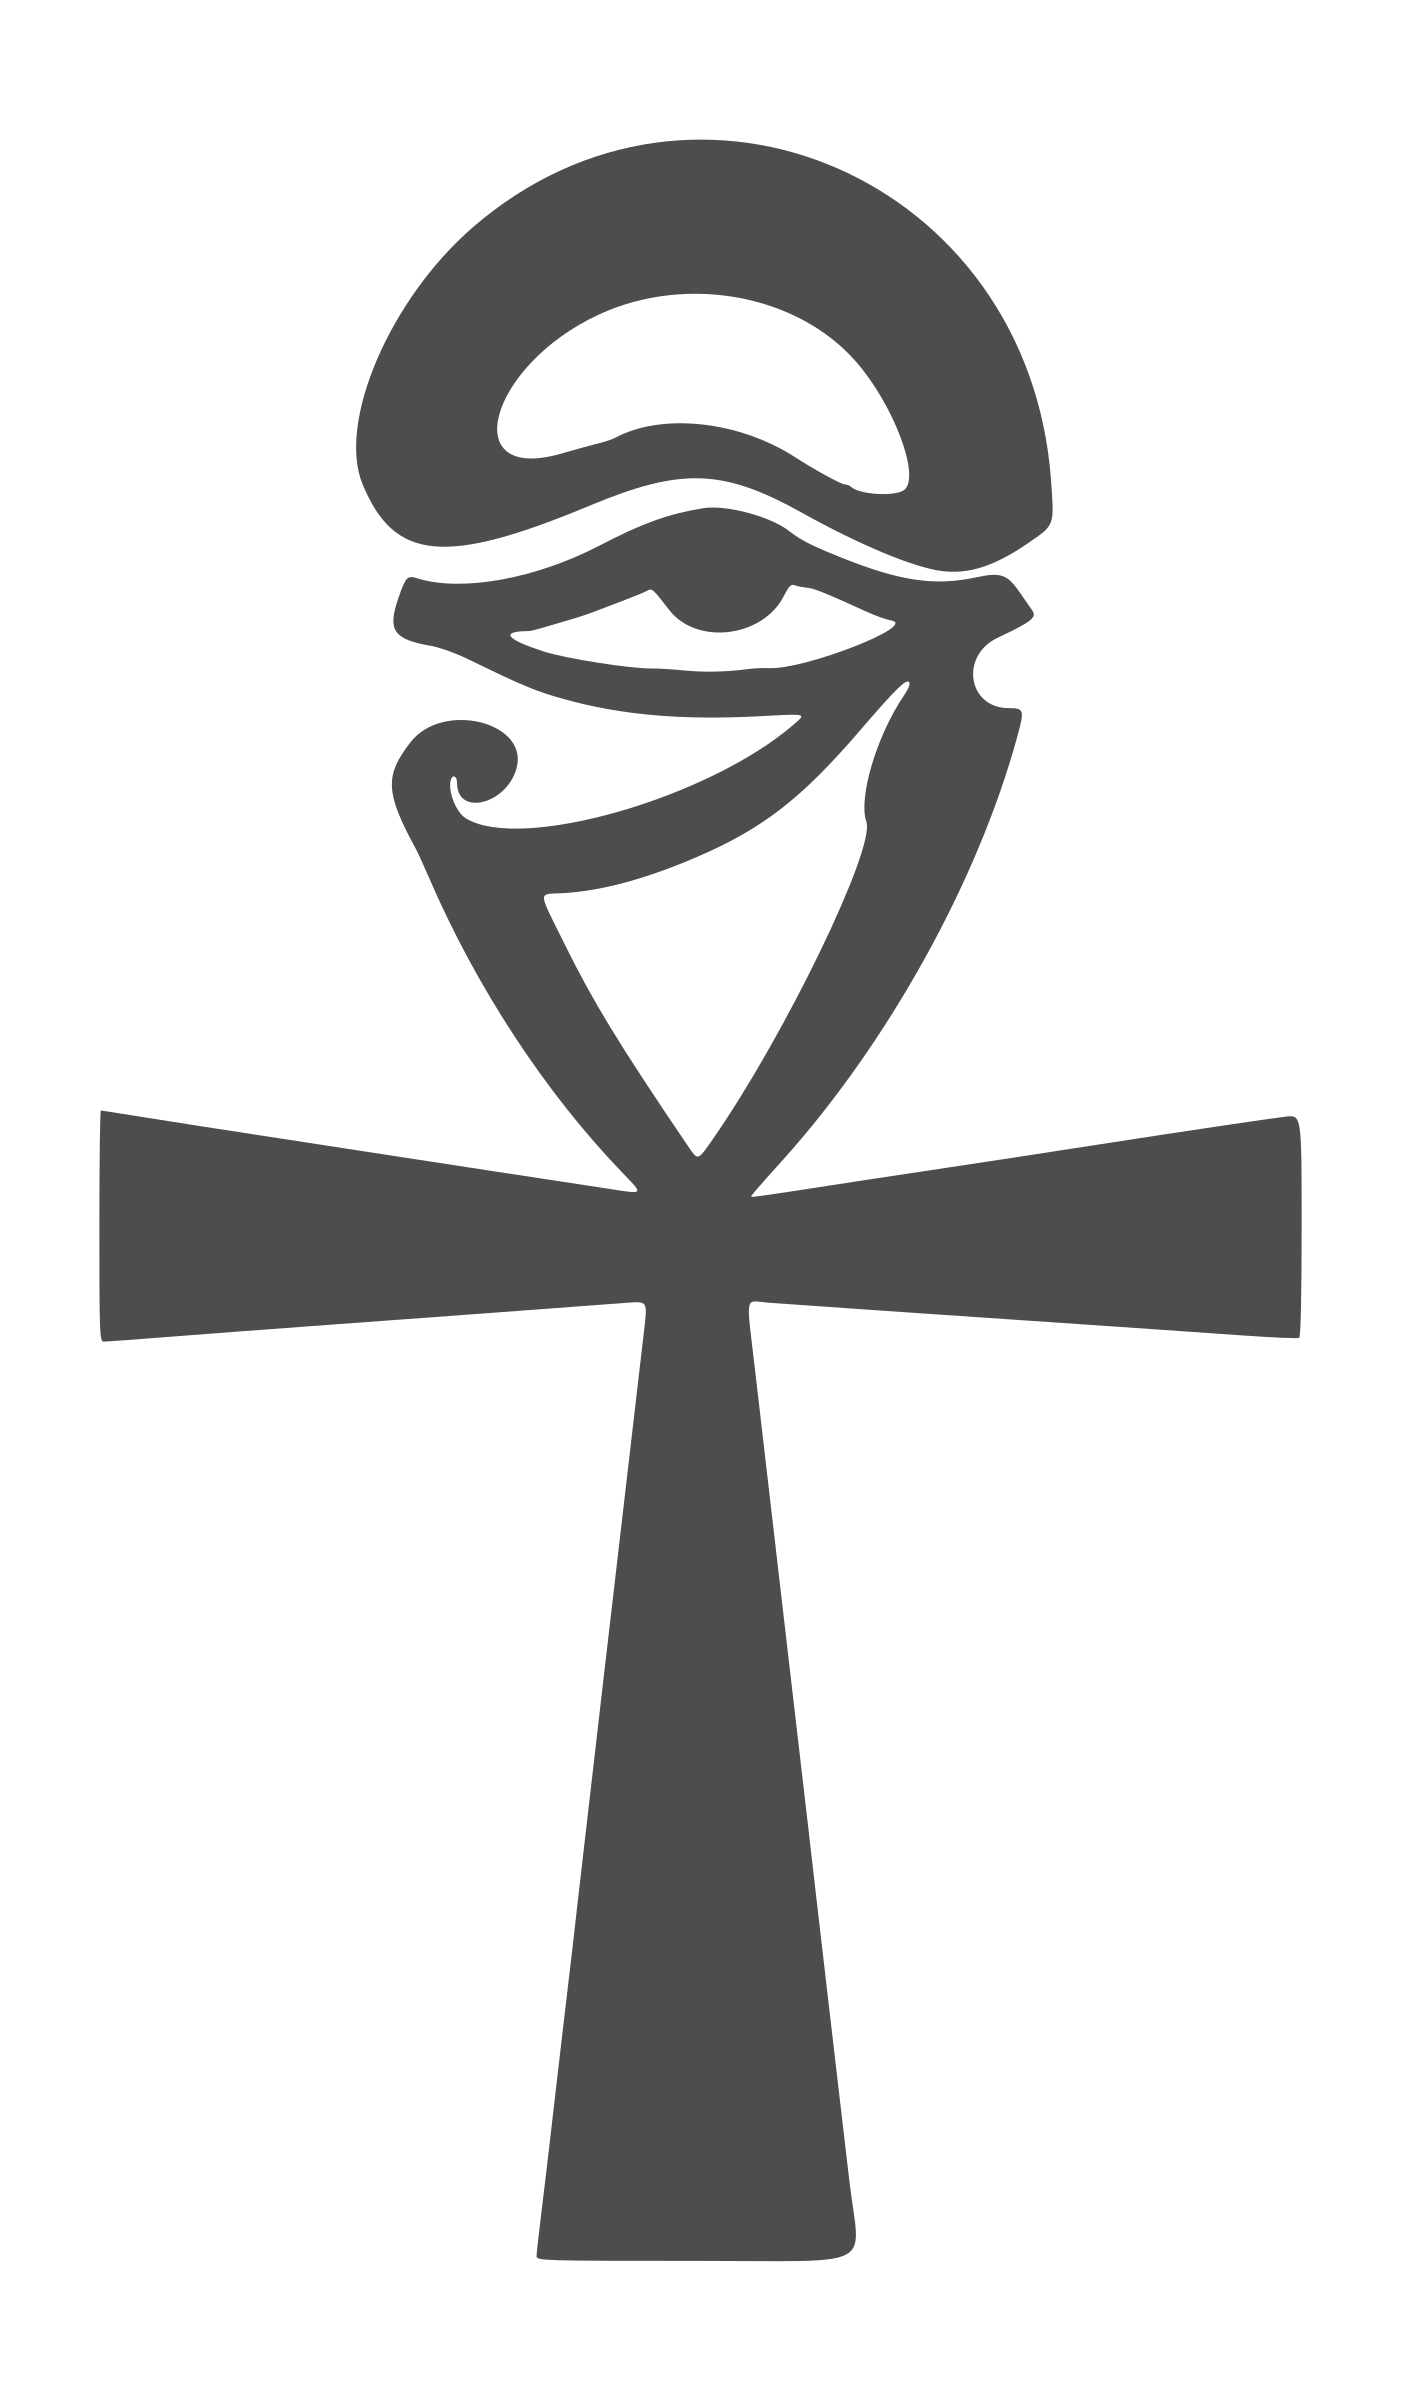 Clipart - Egyptian symbol of wisdom - Símbolo egipcio de